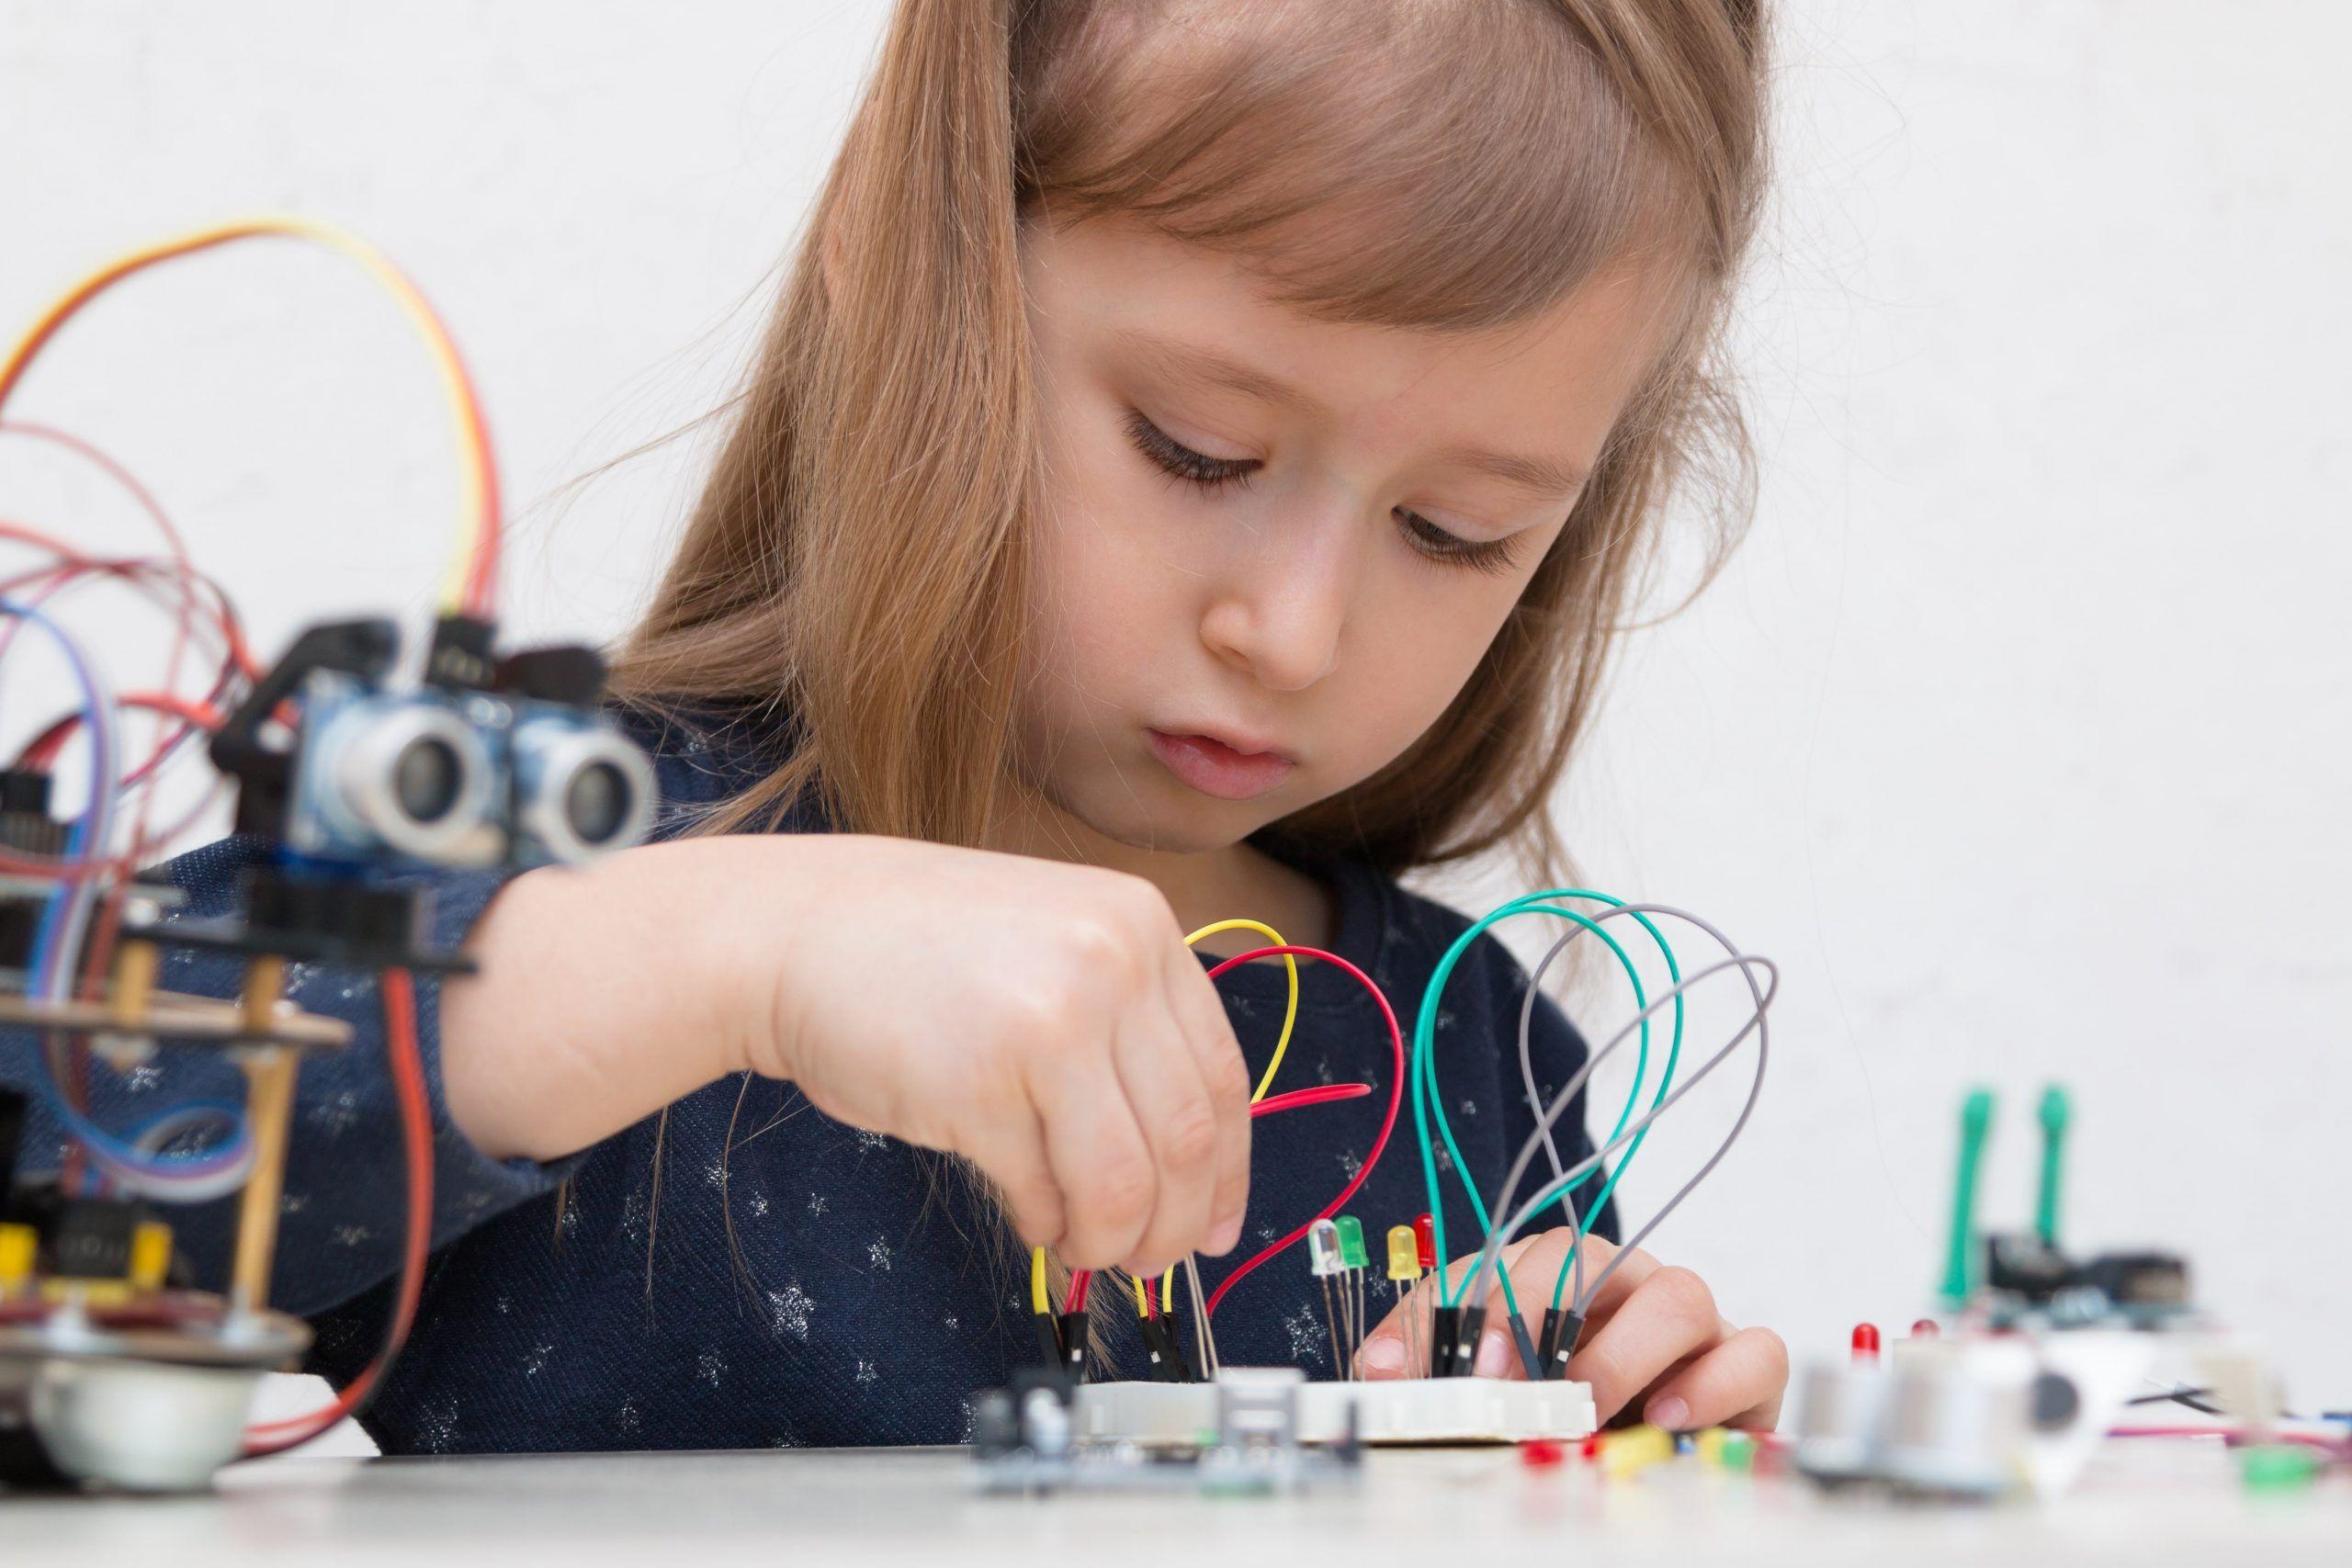 Girl interacting with machine - Learning micro bit coding-min